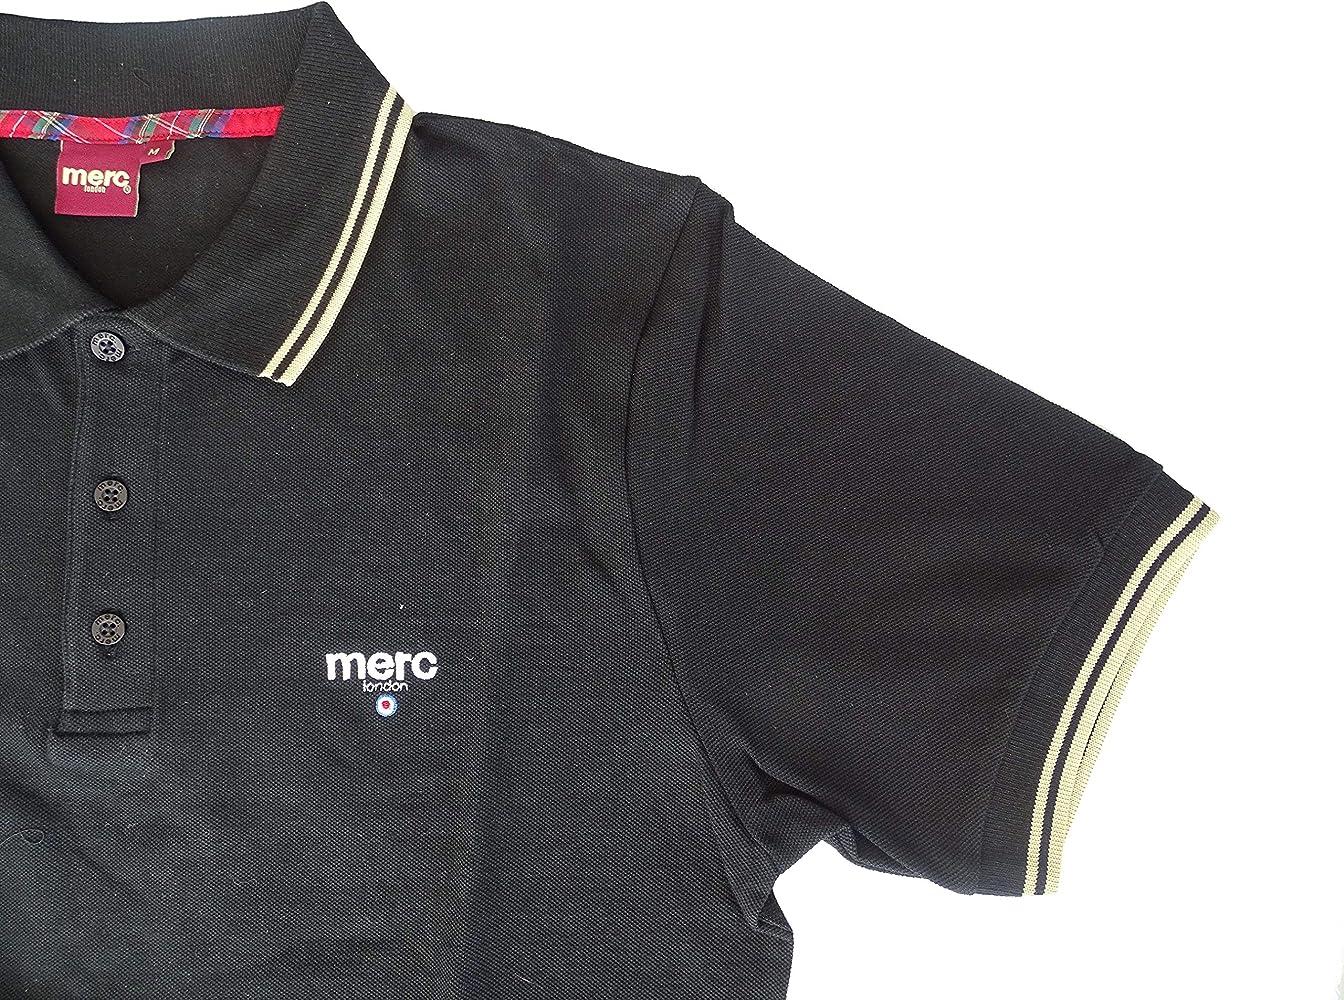 Merc Polo Camiseta para Hombre Men Manga Corta Negro Negro S ...